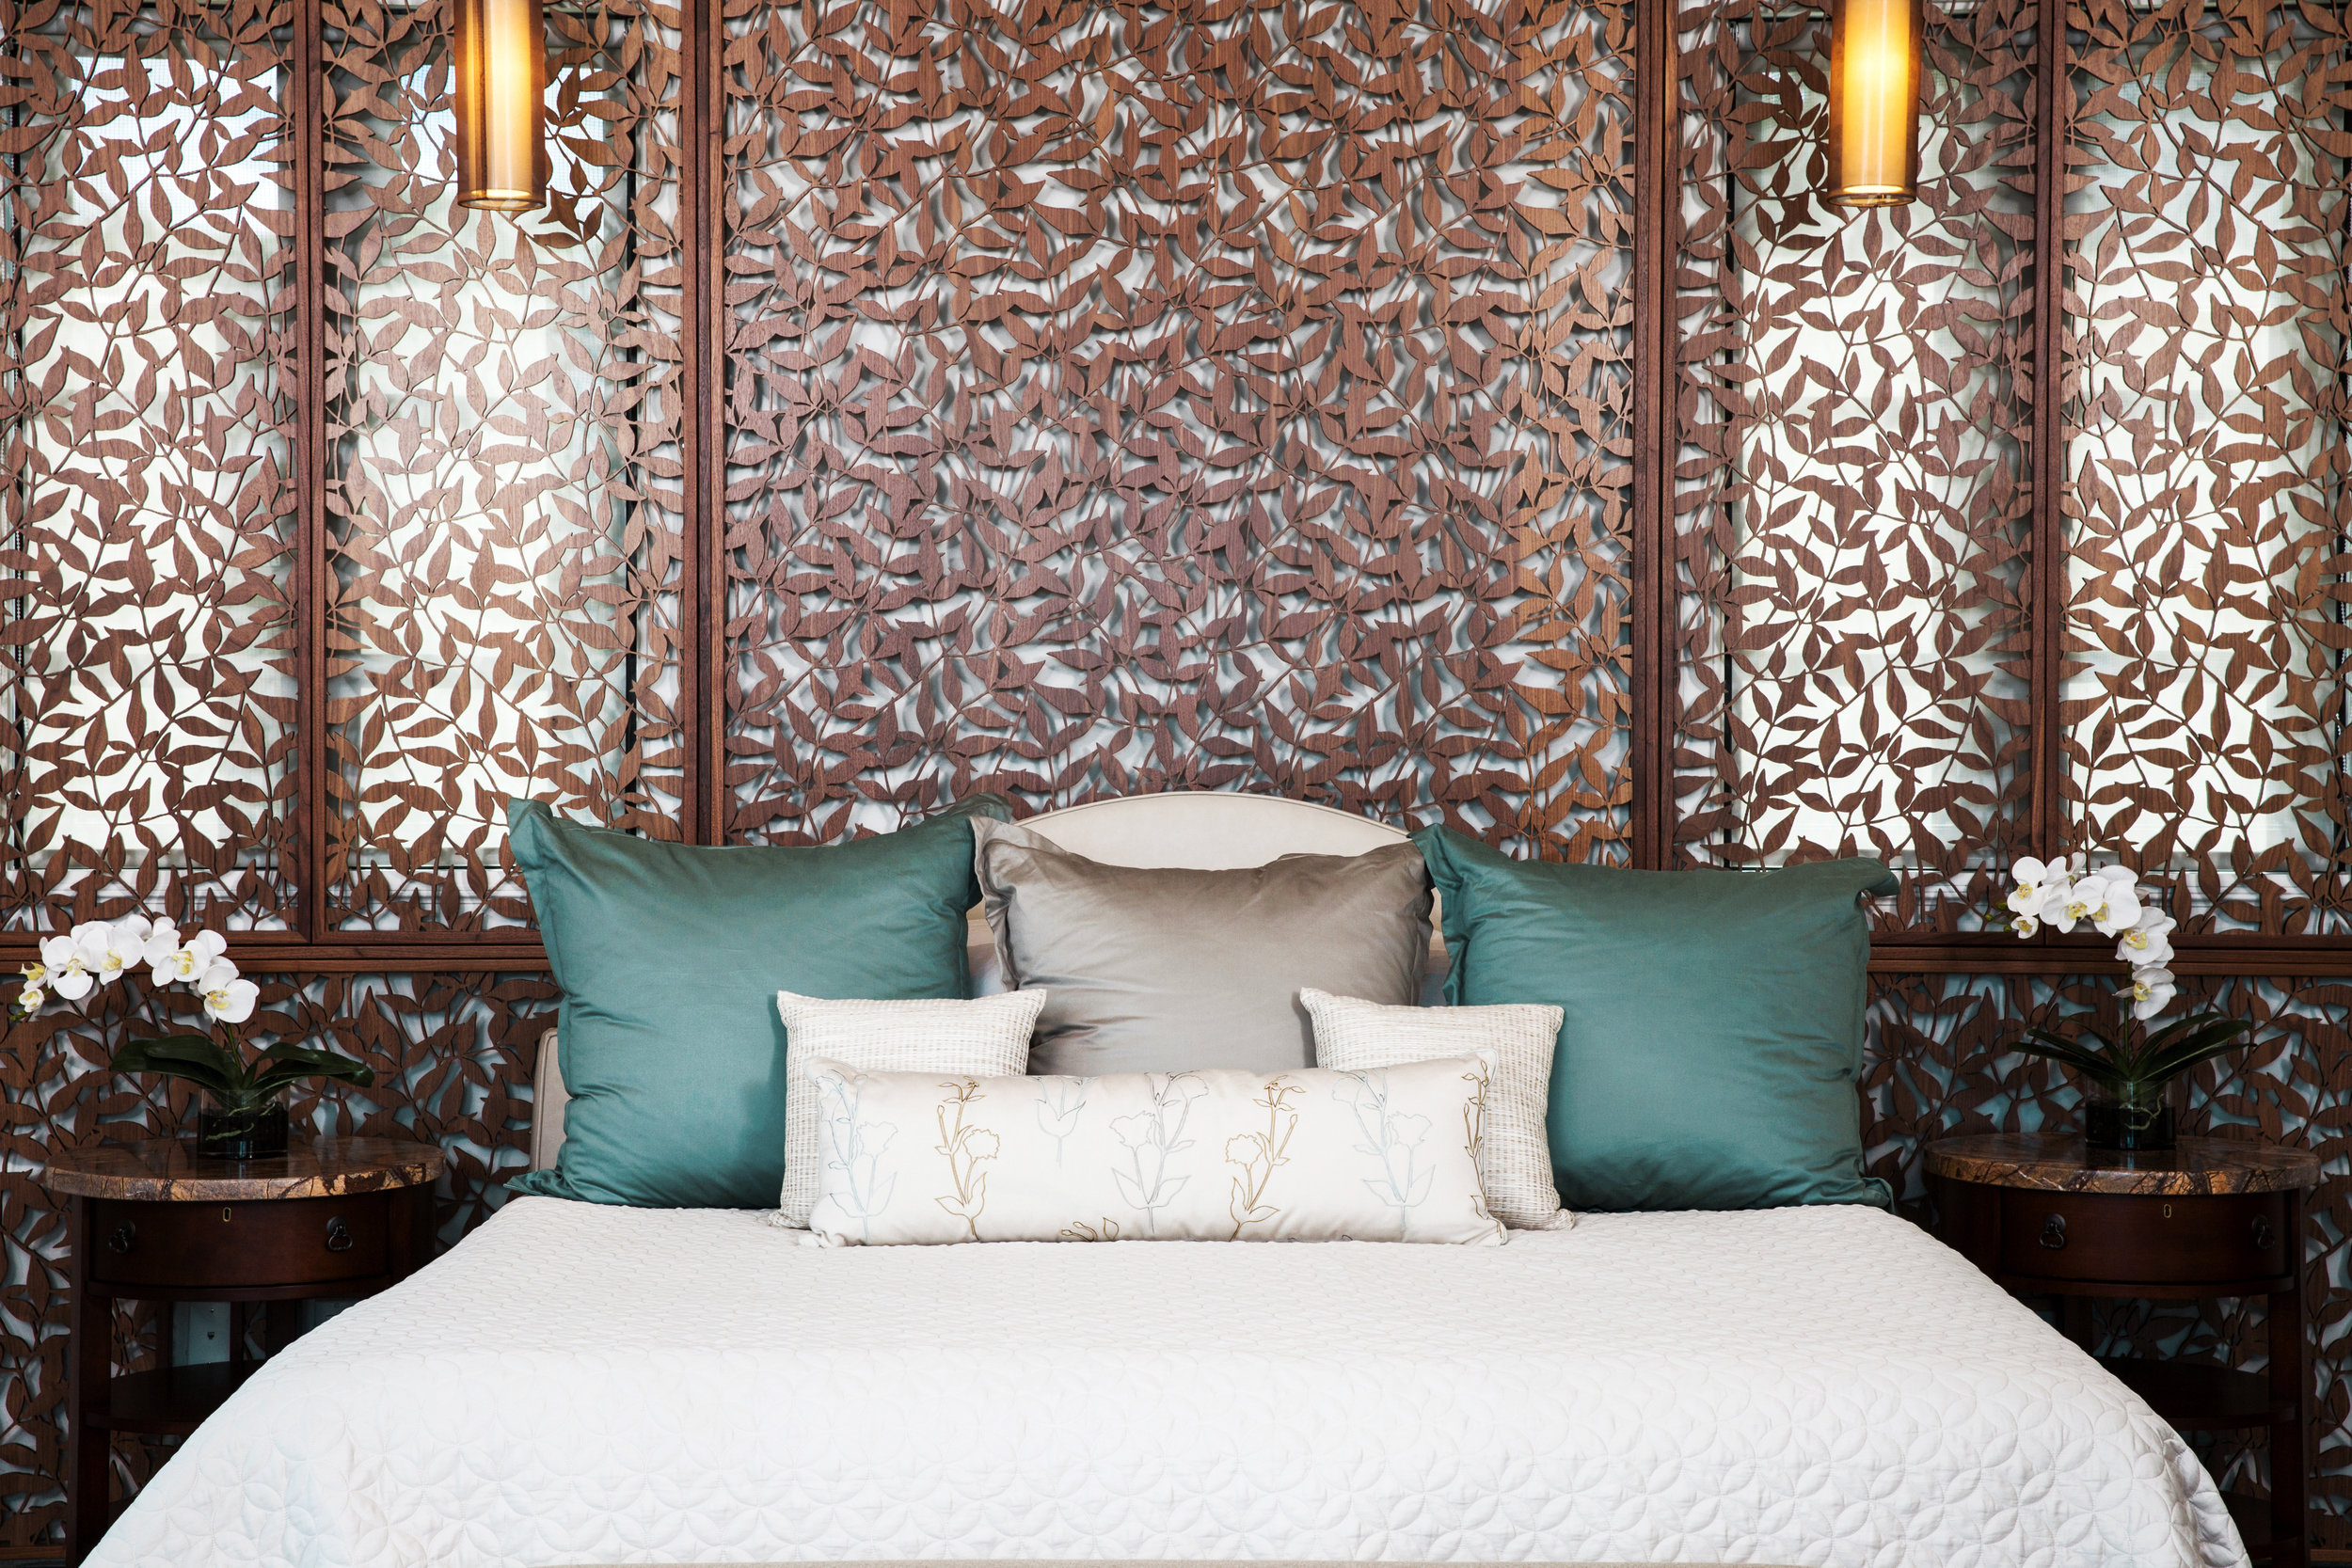 Morgante Wilson Architects  - Residence, St. John, FL  Heavenly Bamboo, Decorative headboard and window screen